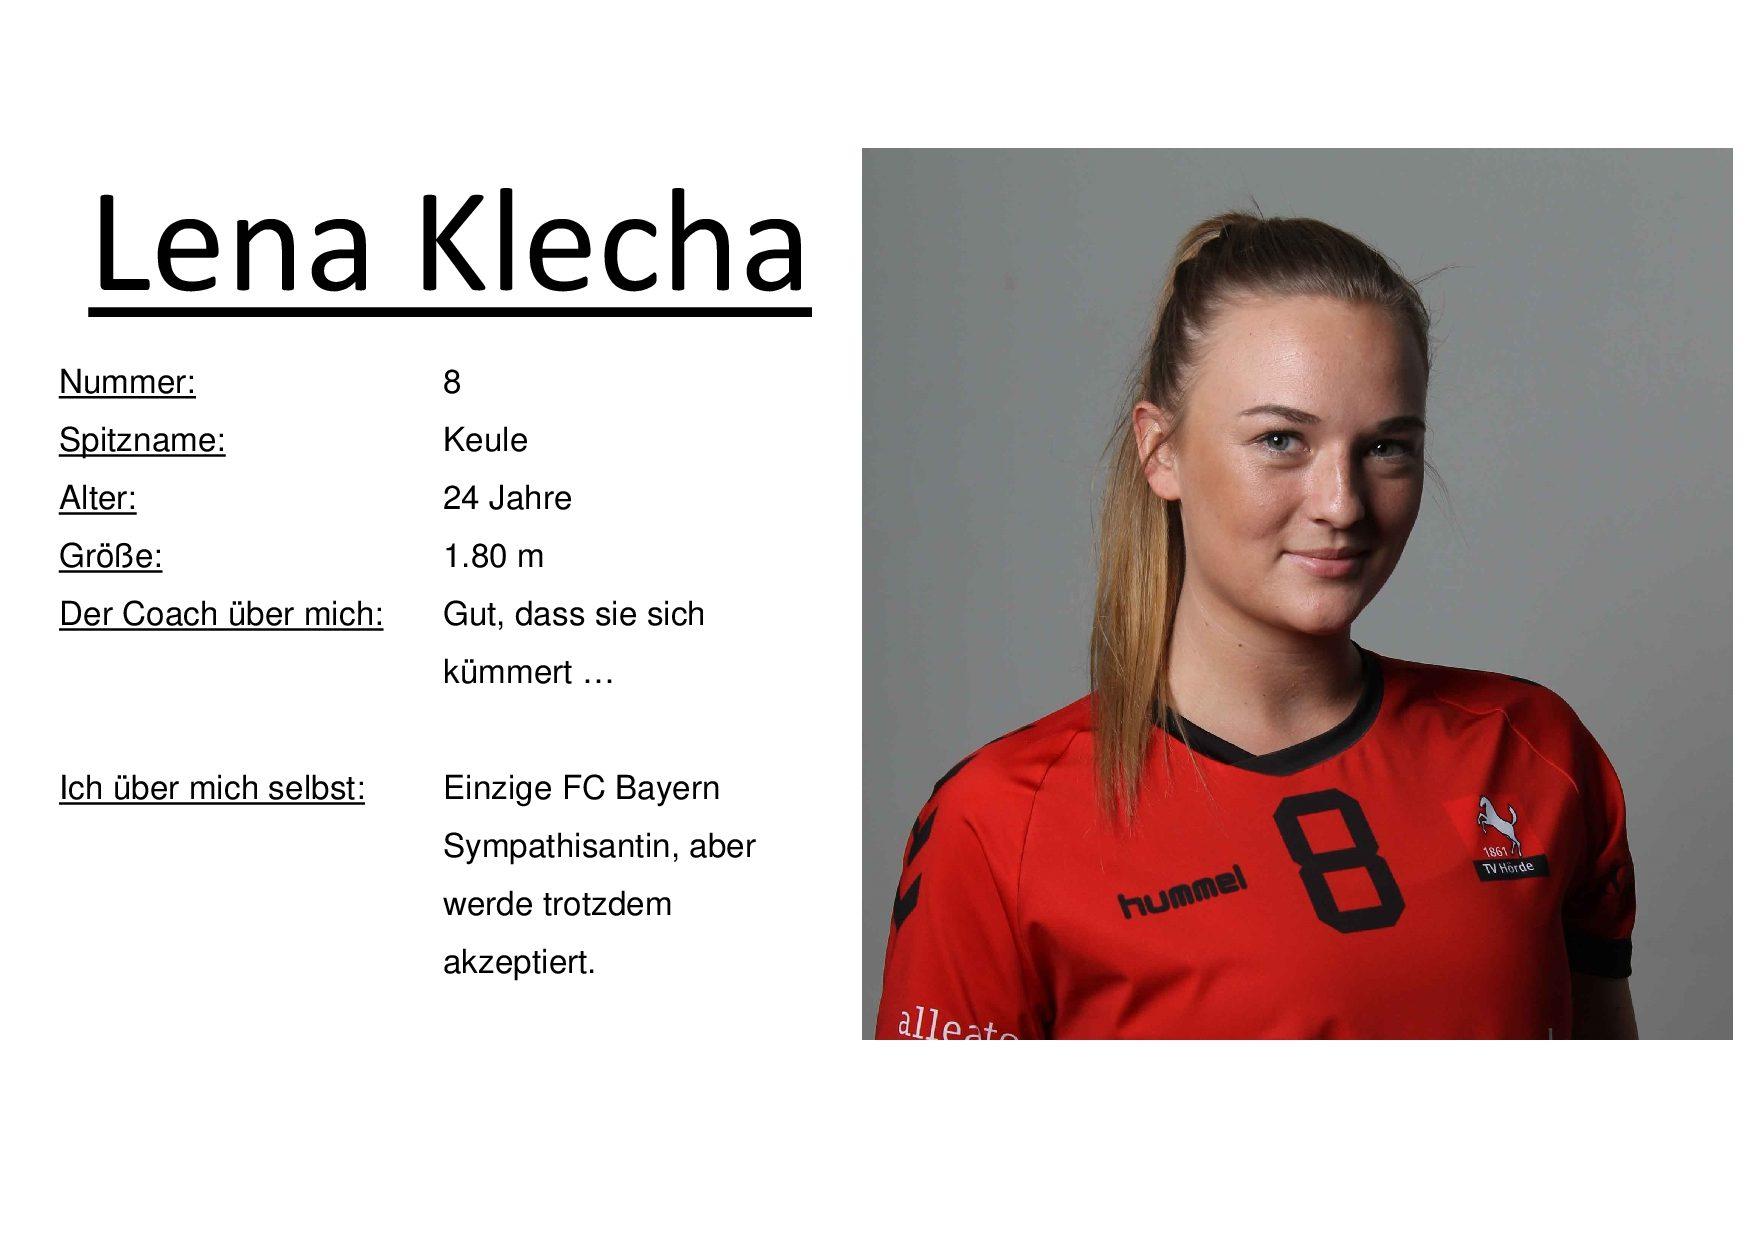 Lena Klecha